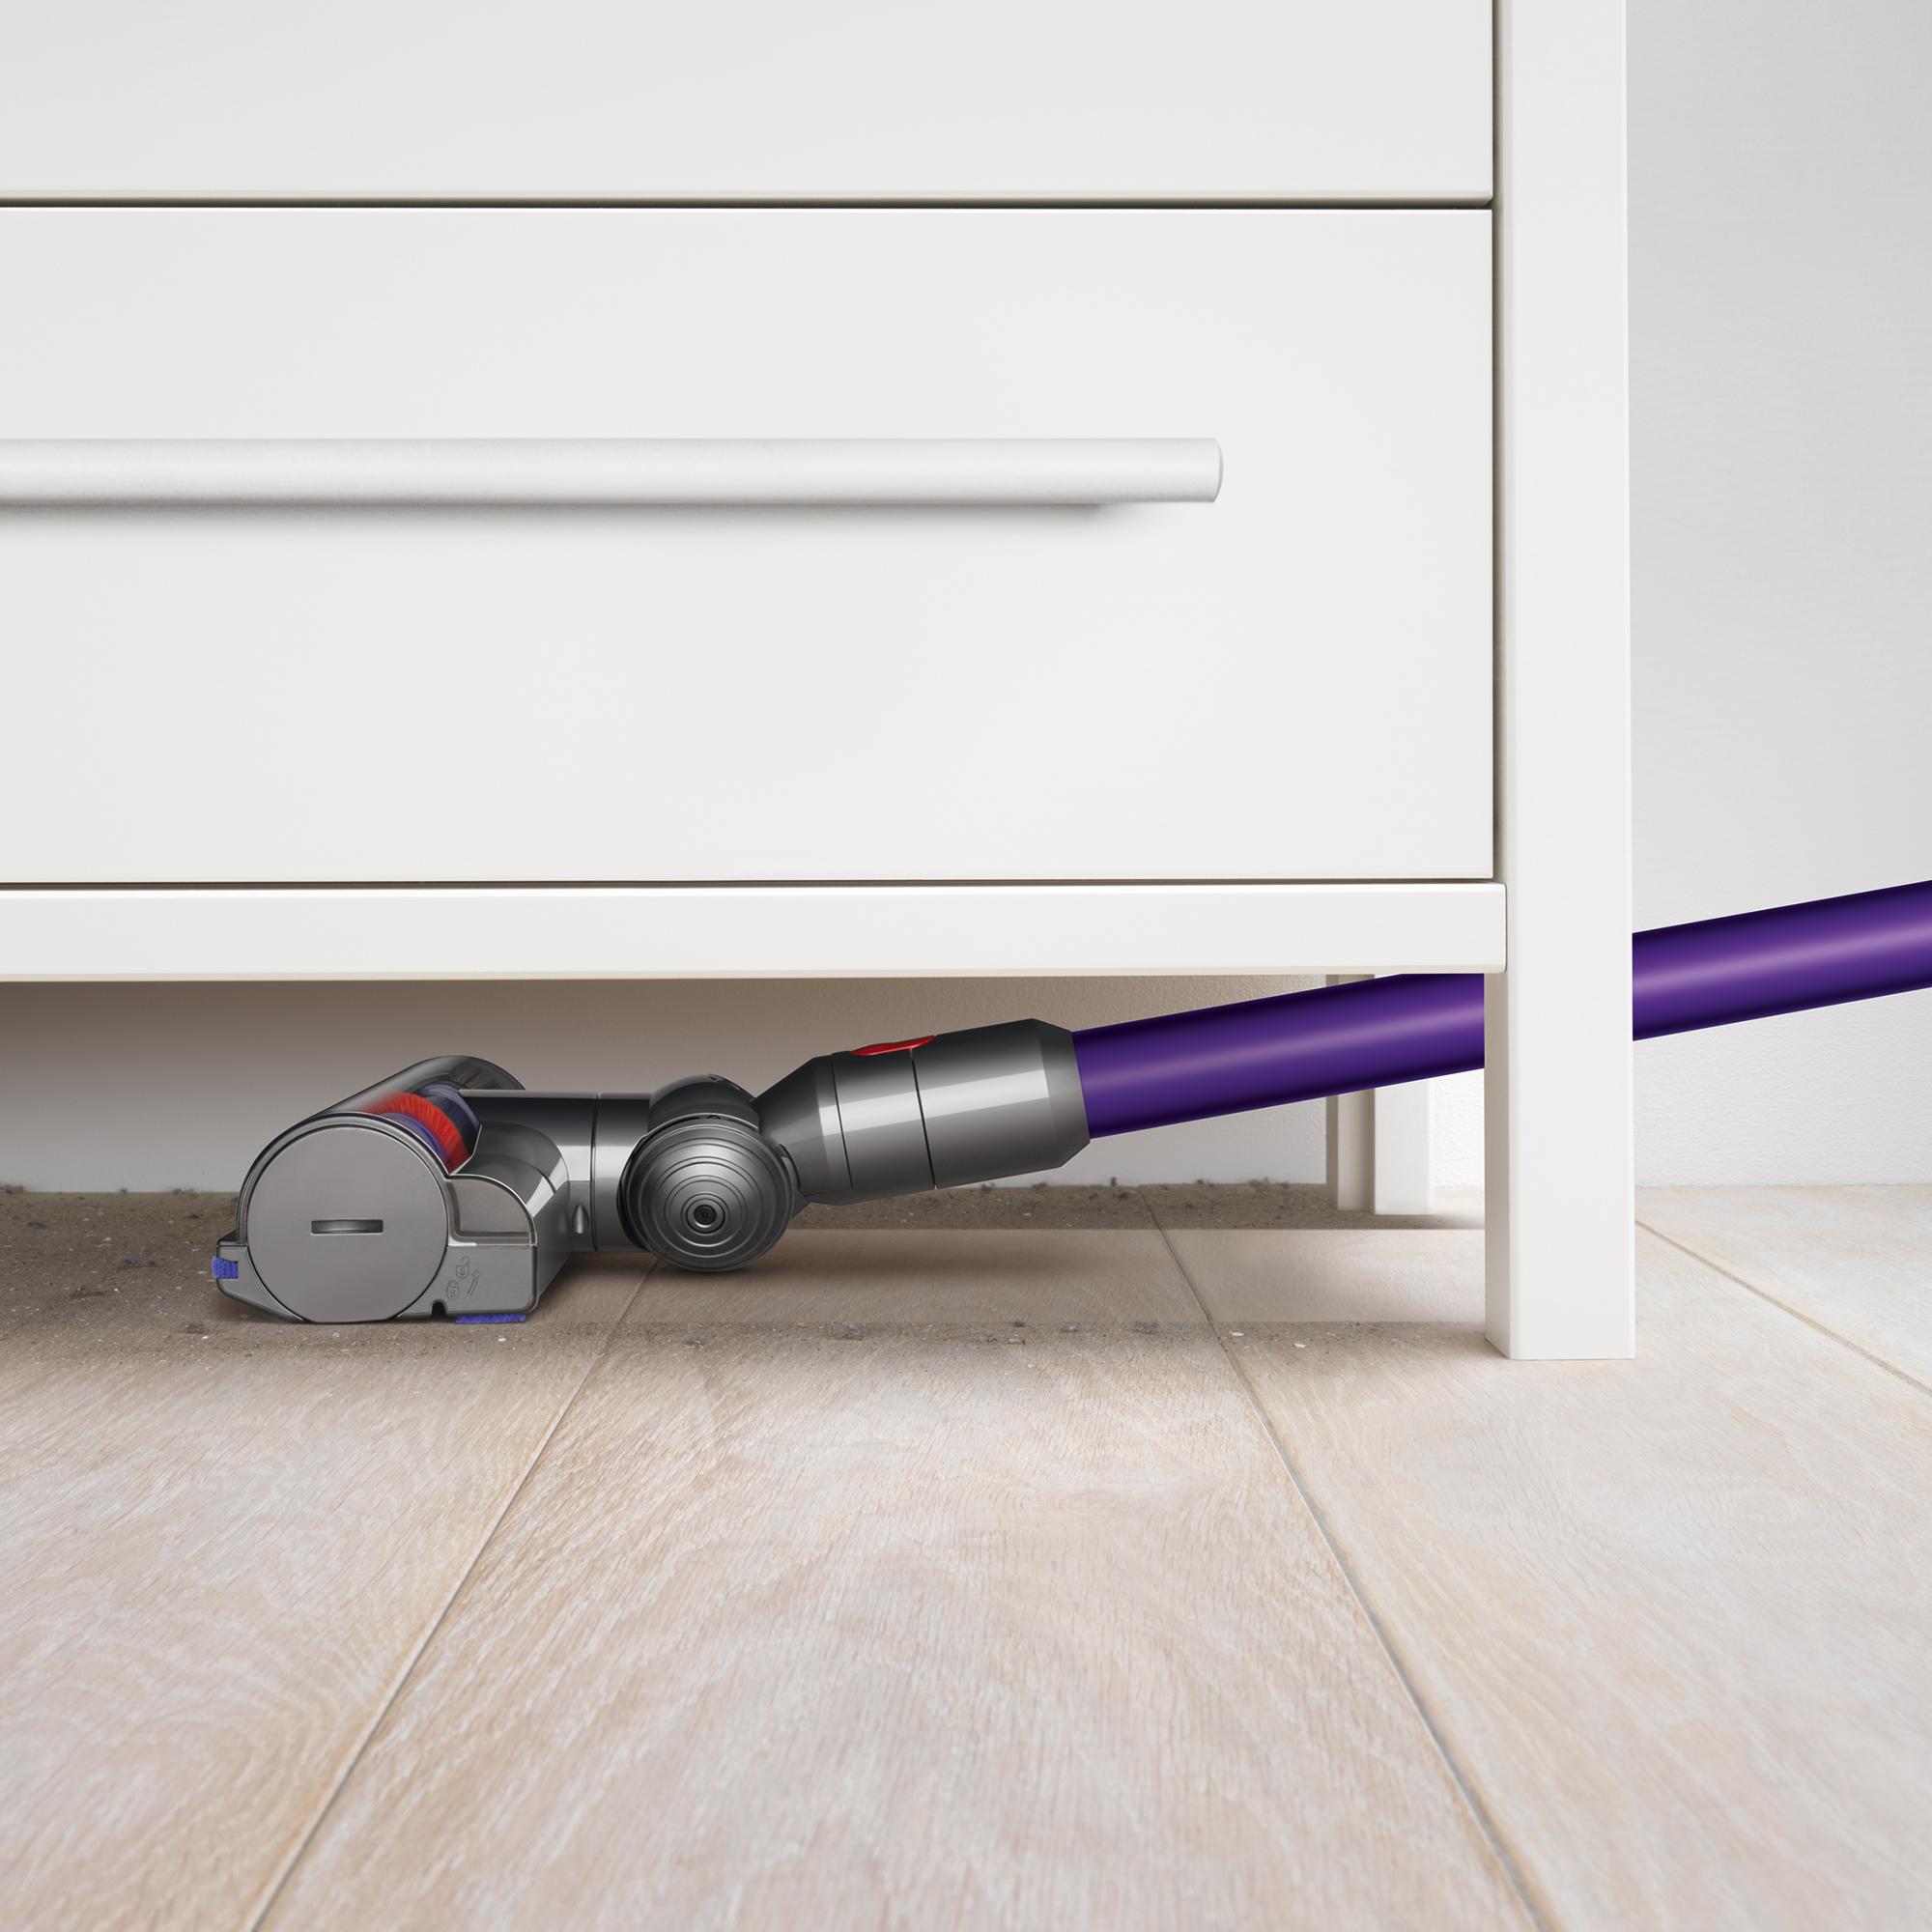 Dyson-V7-Animal-Cordless-HEPA-Vacuum-with-Bonus-Tools-New thumbnail 28